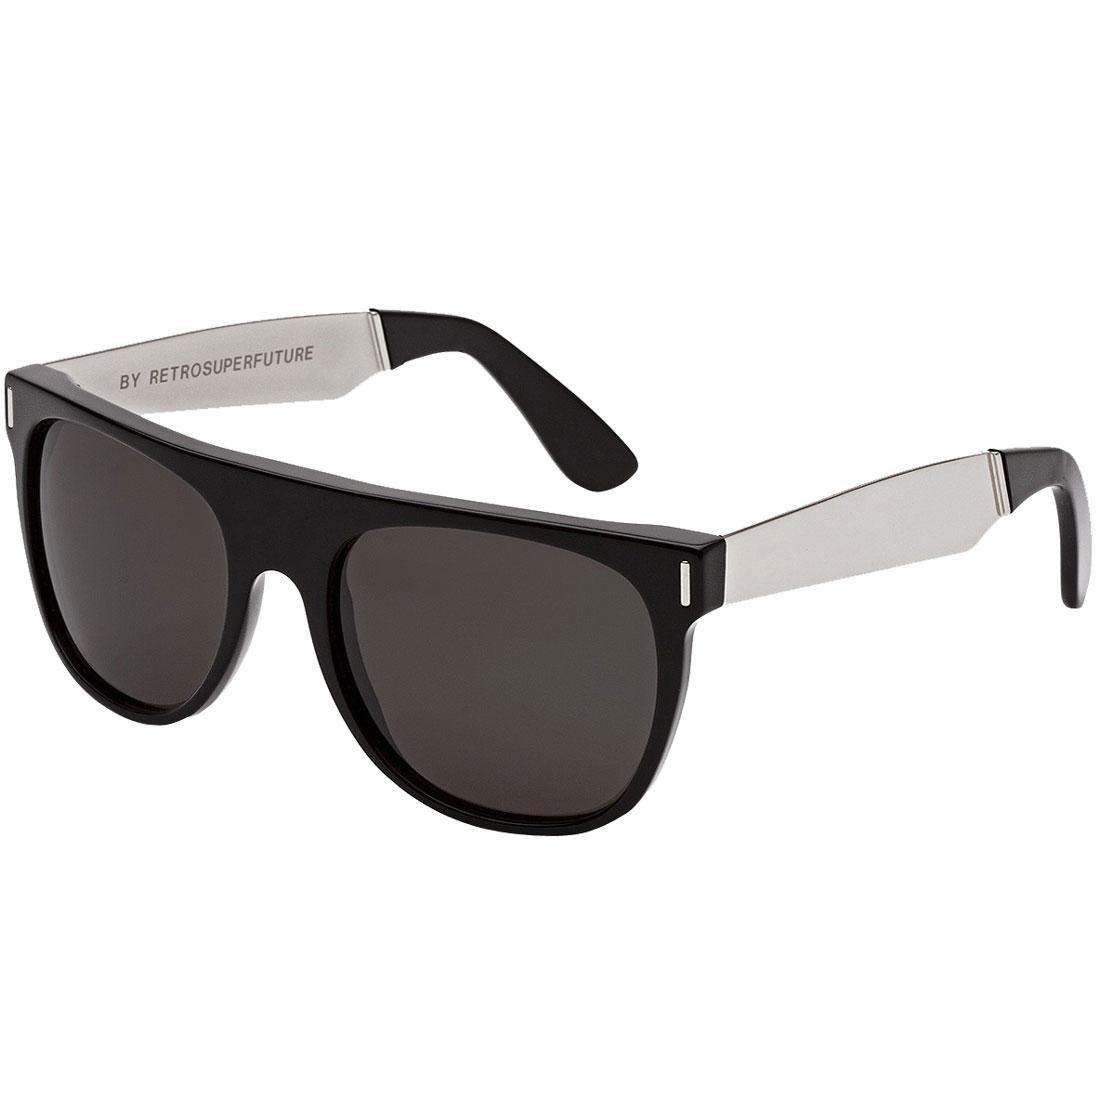 Super Sunglasses Flat Top Large Sunglasses (black / silver)